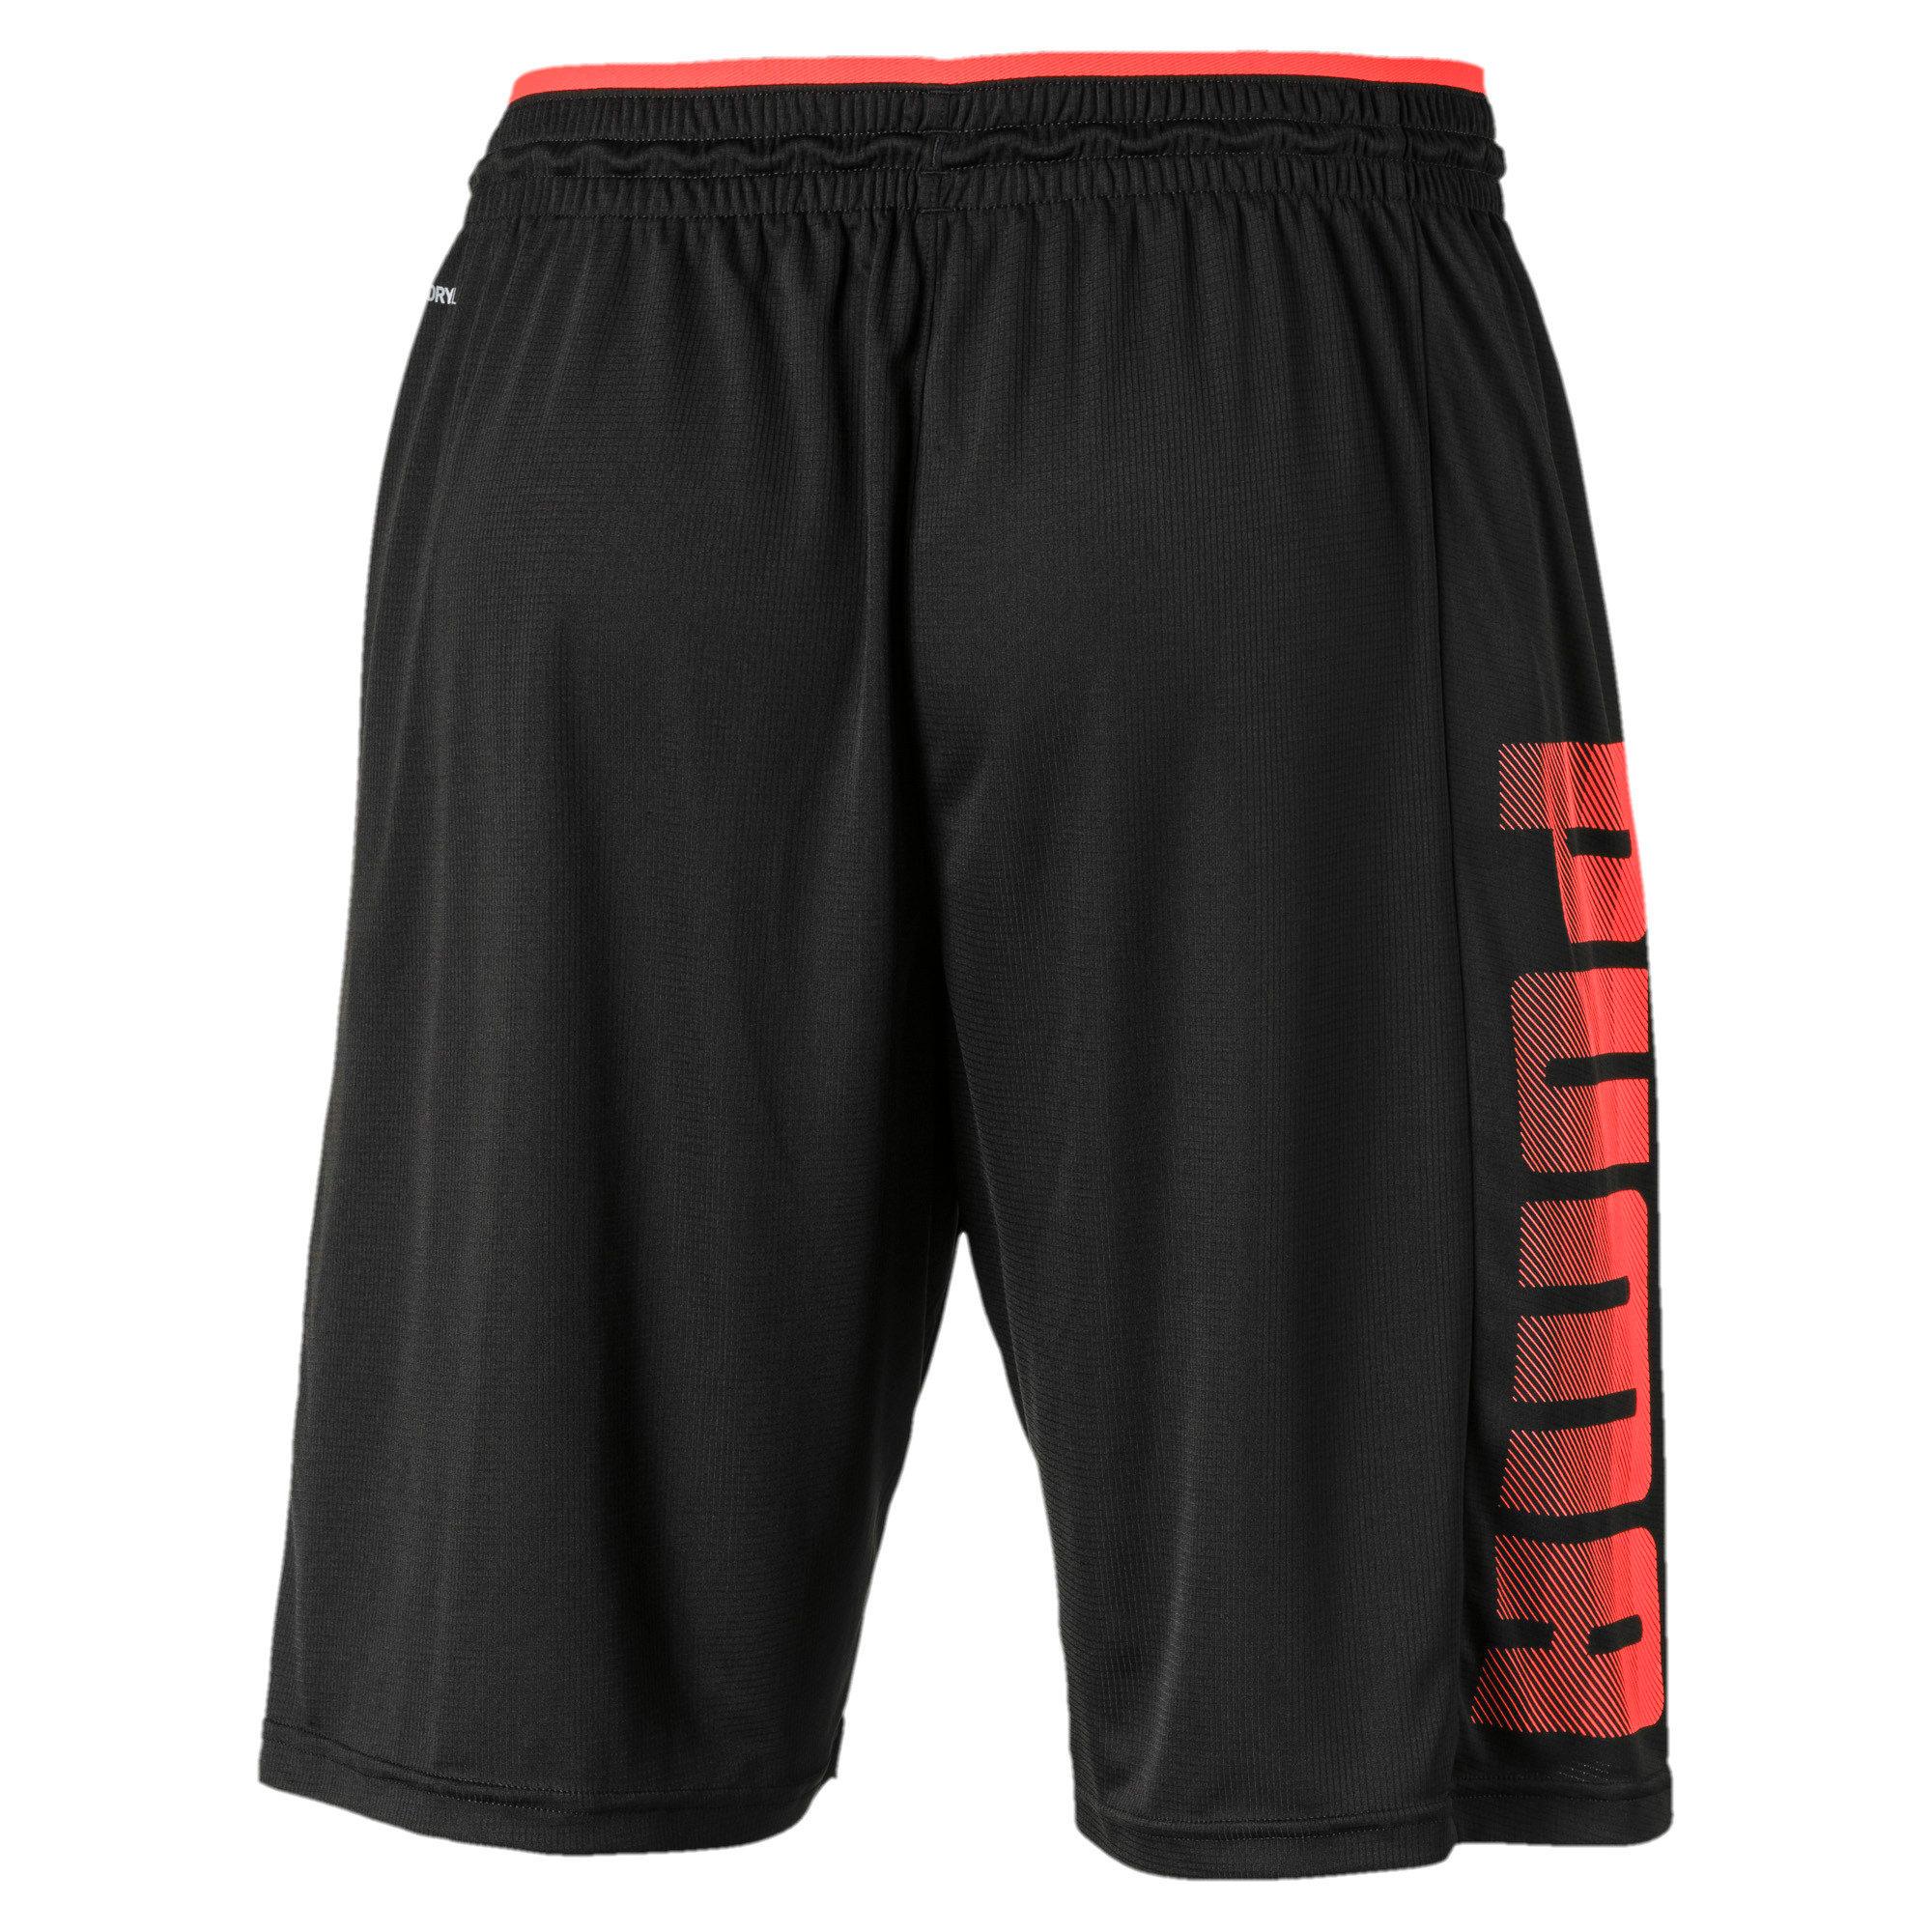 Thumbnail 5 of Collective Men's Knit Shorts, Puma Black-Nrgy Red, medium